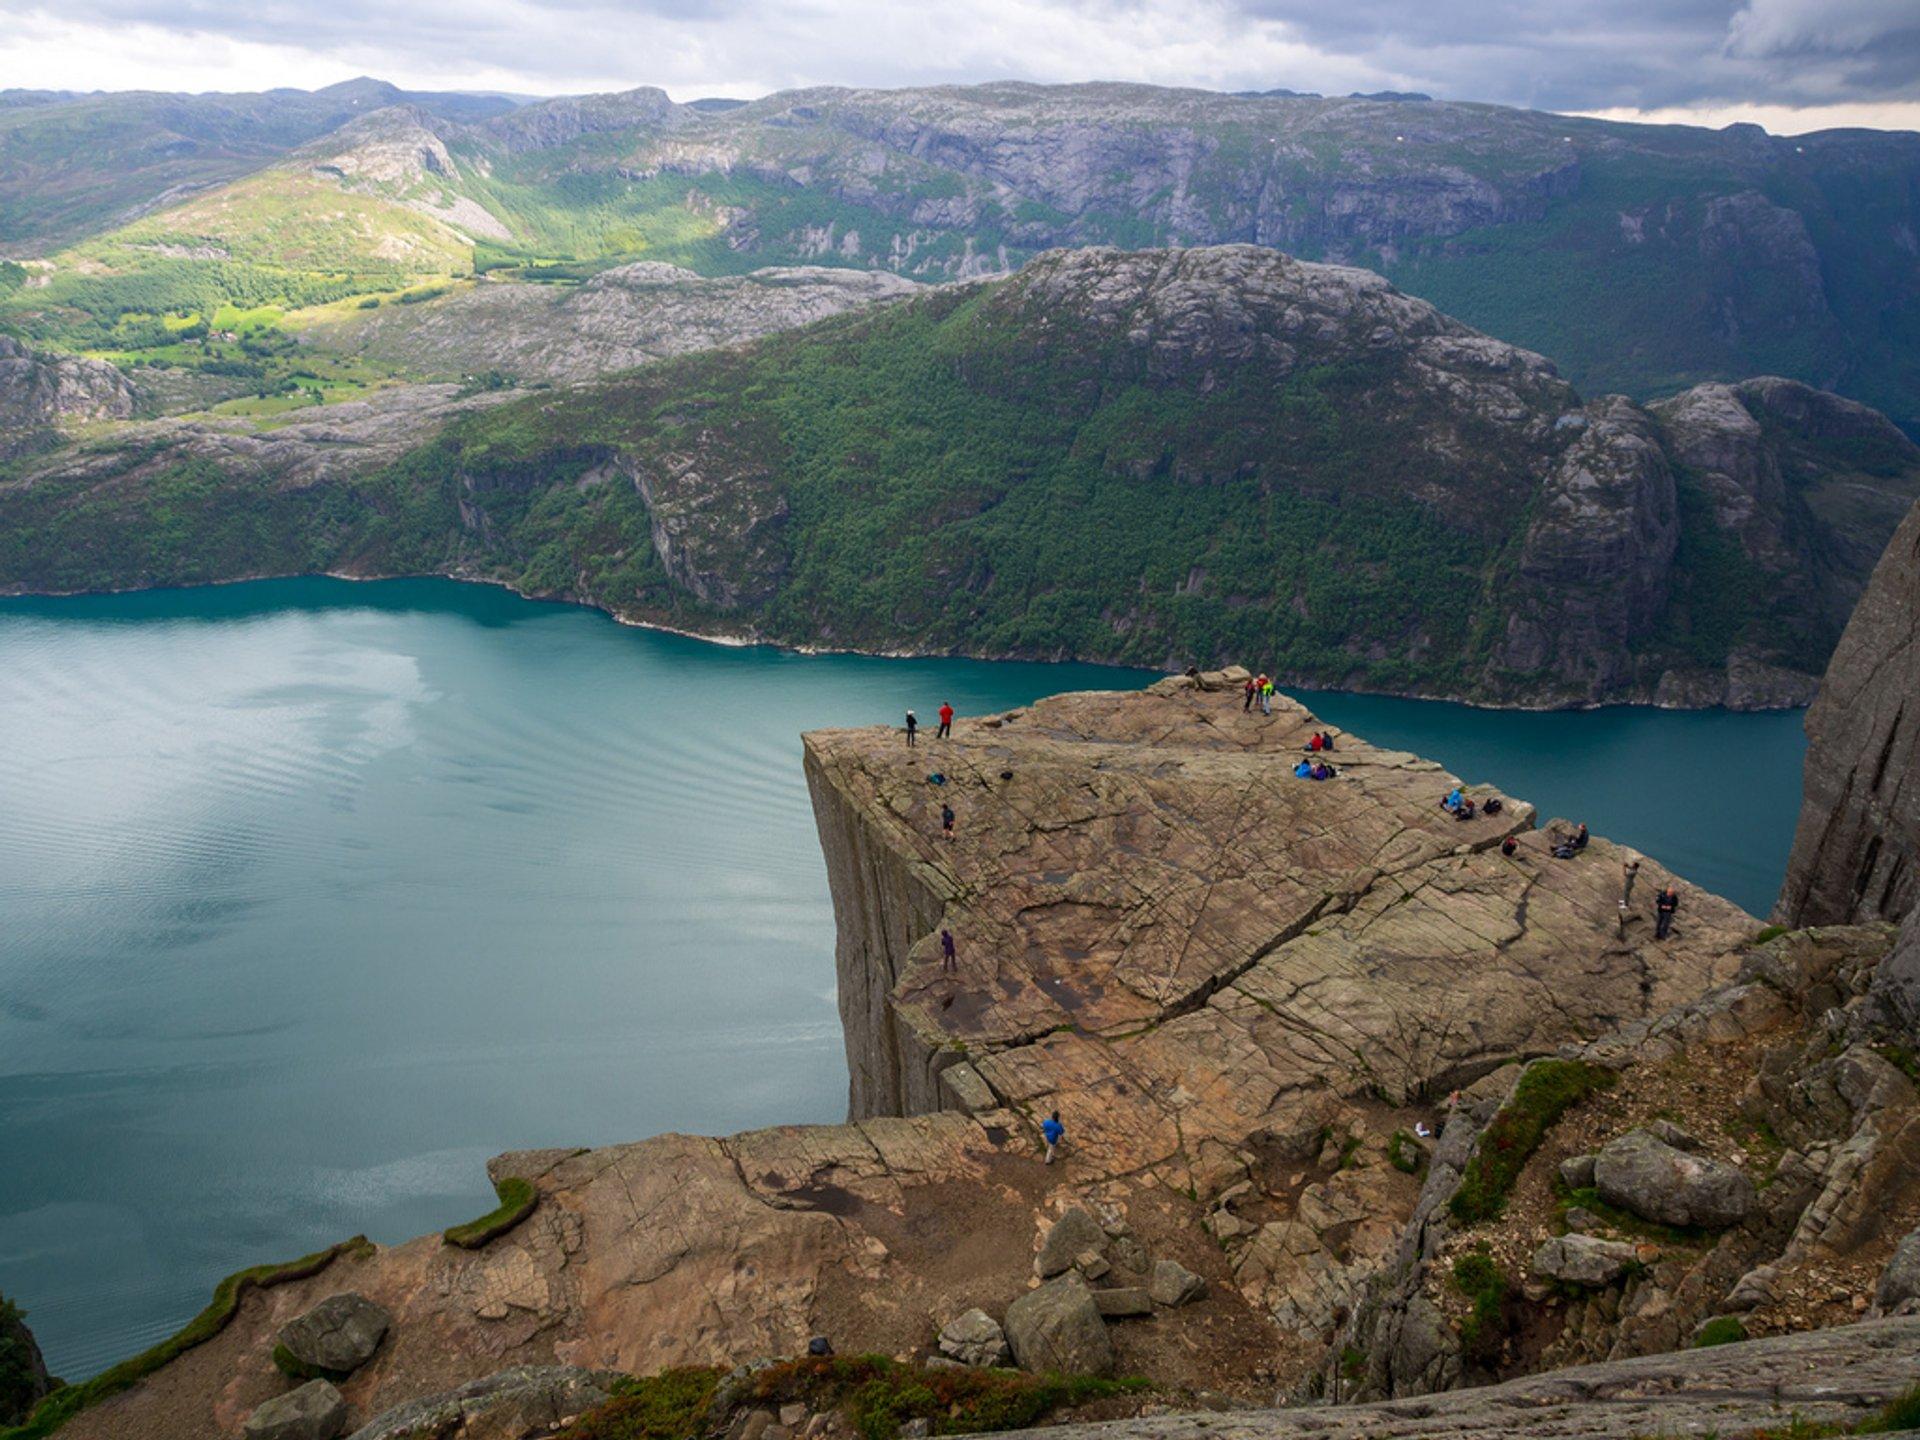 Hike to Preikestolen (Pulpit Rock) in Norway 2020 - Best Time